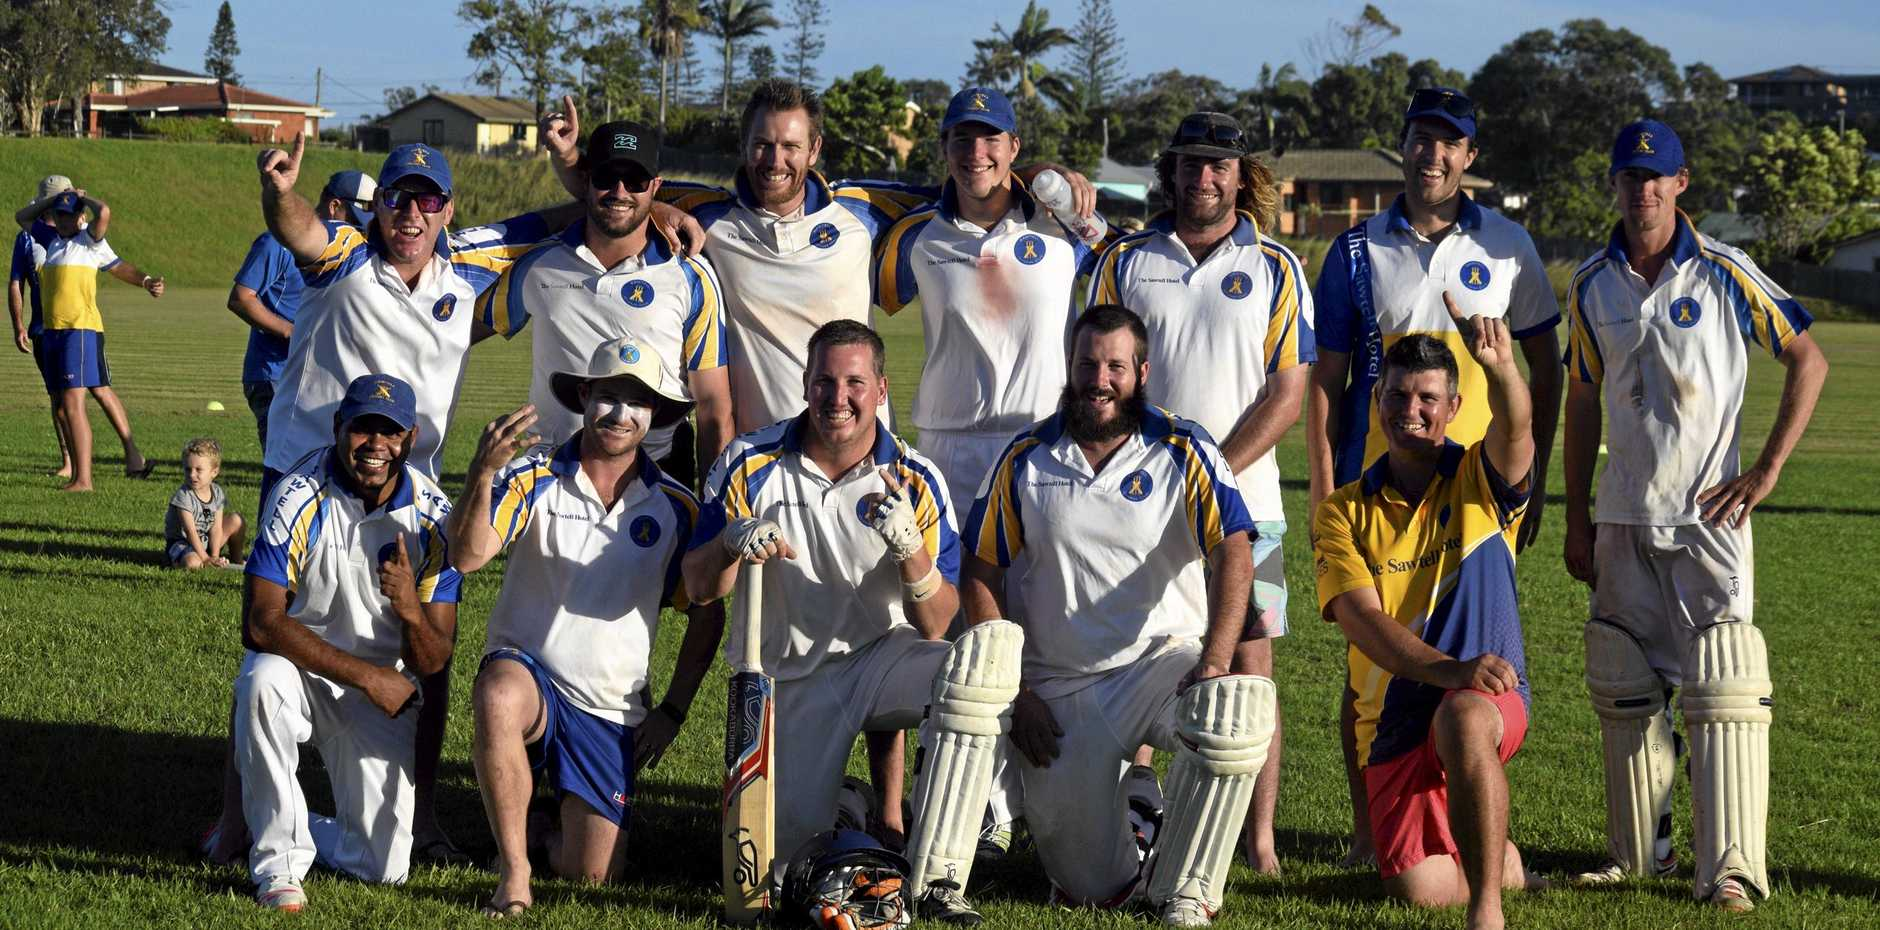 The Sawtell players celebrate winning the CHDCA first grade cricket grand final against Nana Glen.